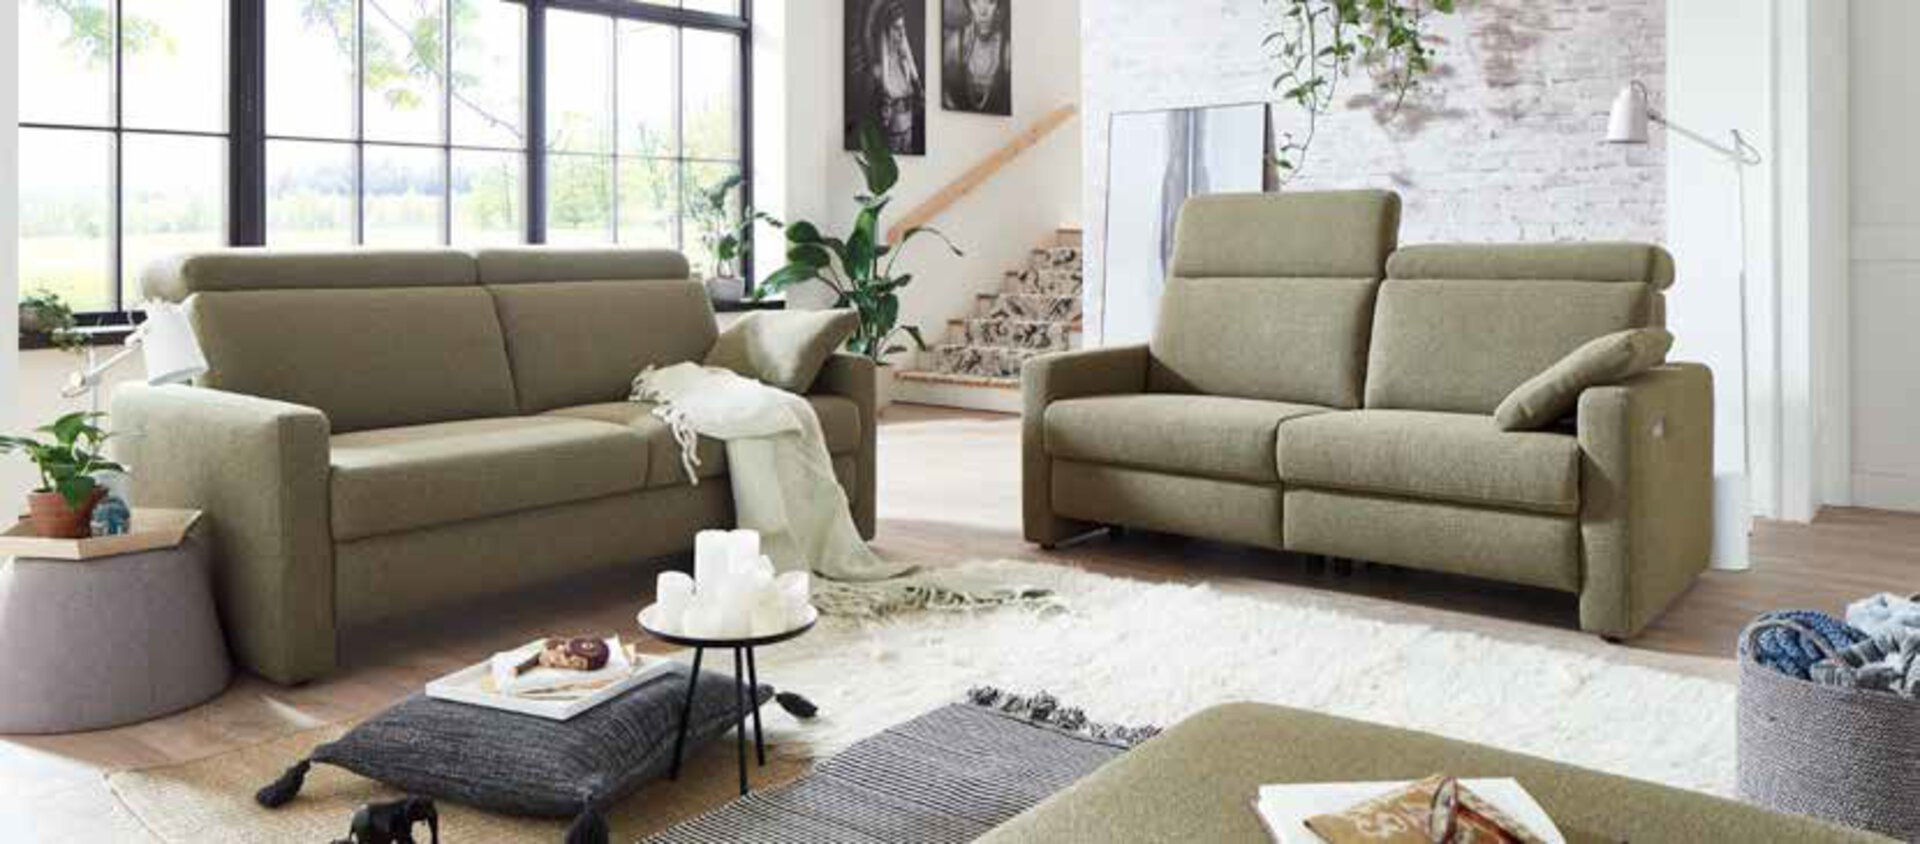 Sofa 3-Sitzer BENEFIT Vito Textil grün